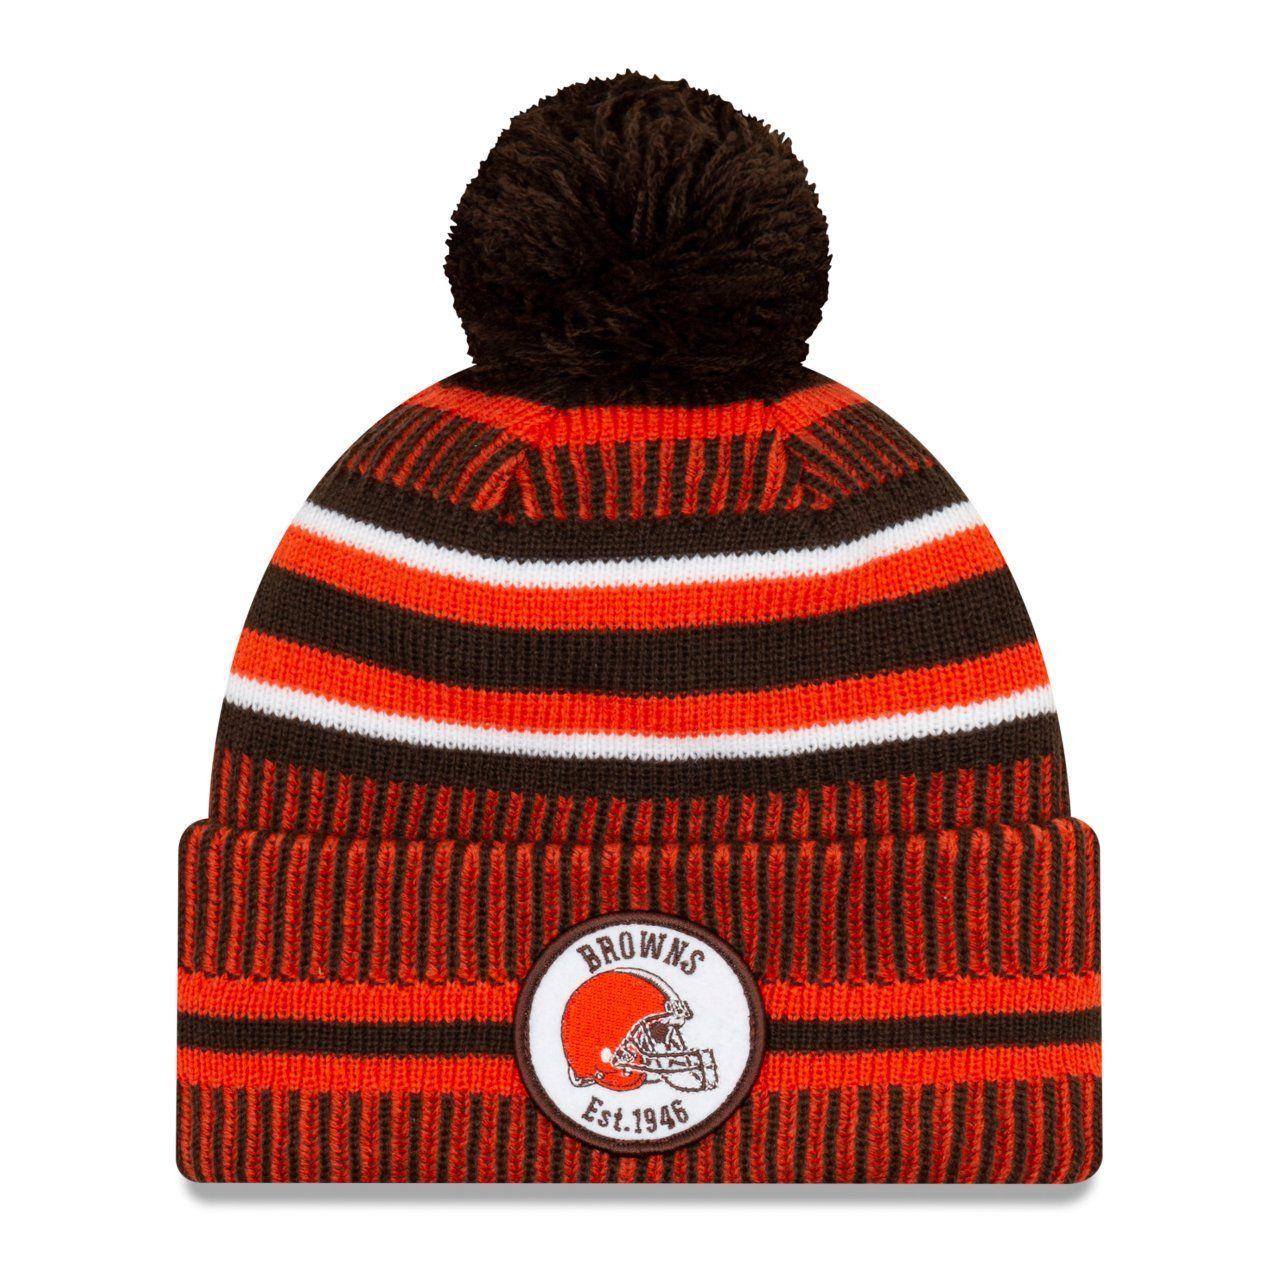 amfoo - New Era Sideline Bommel Kinder Youth Mütze Cleveland Browns